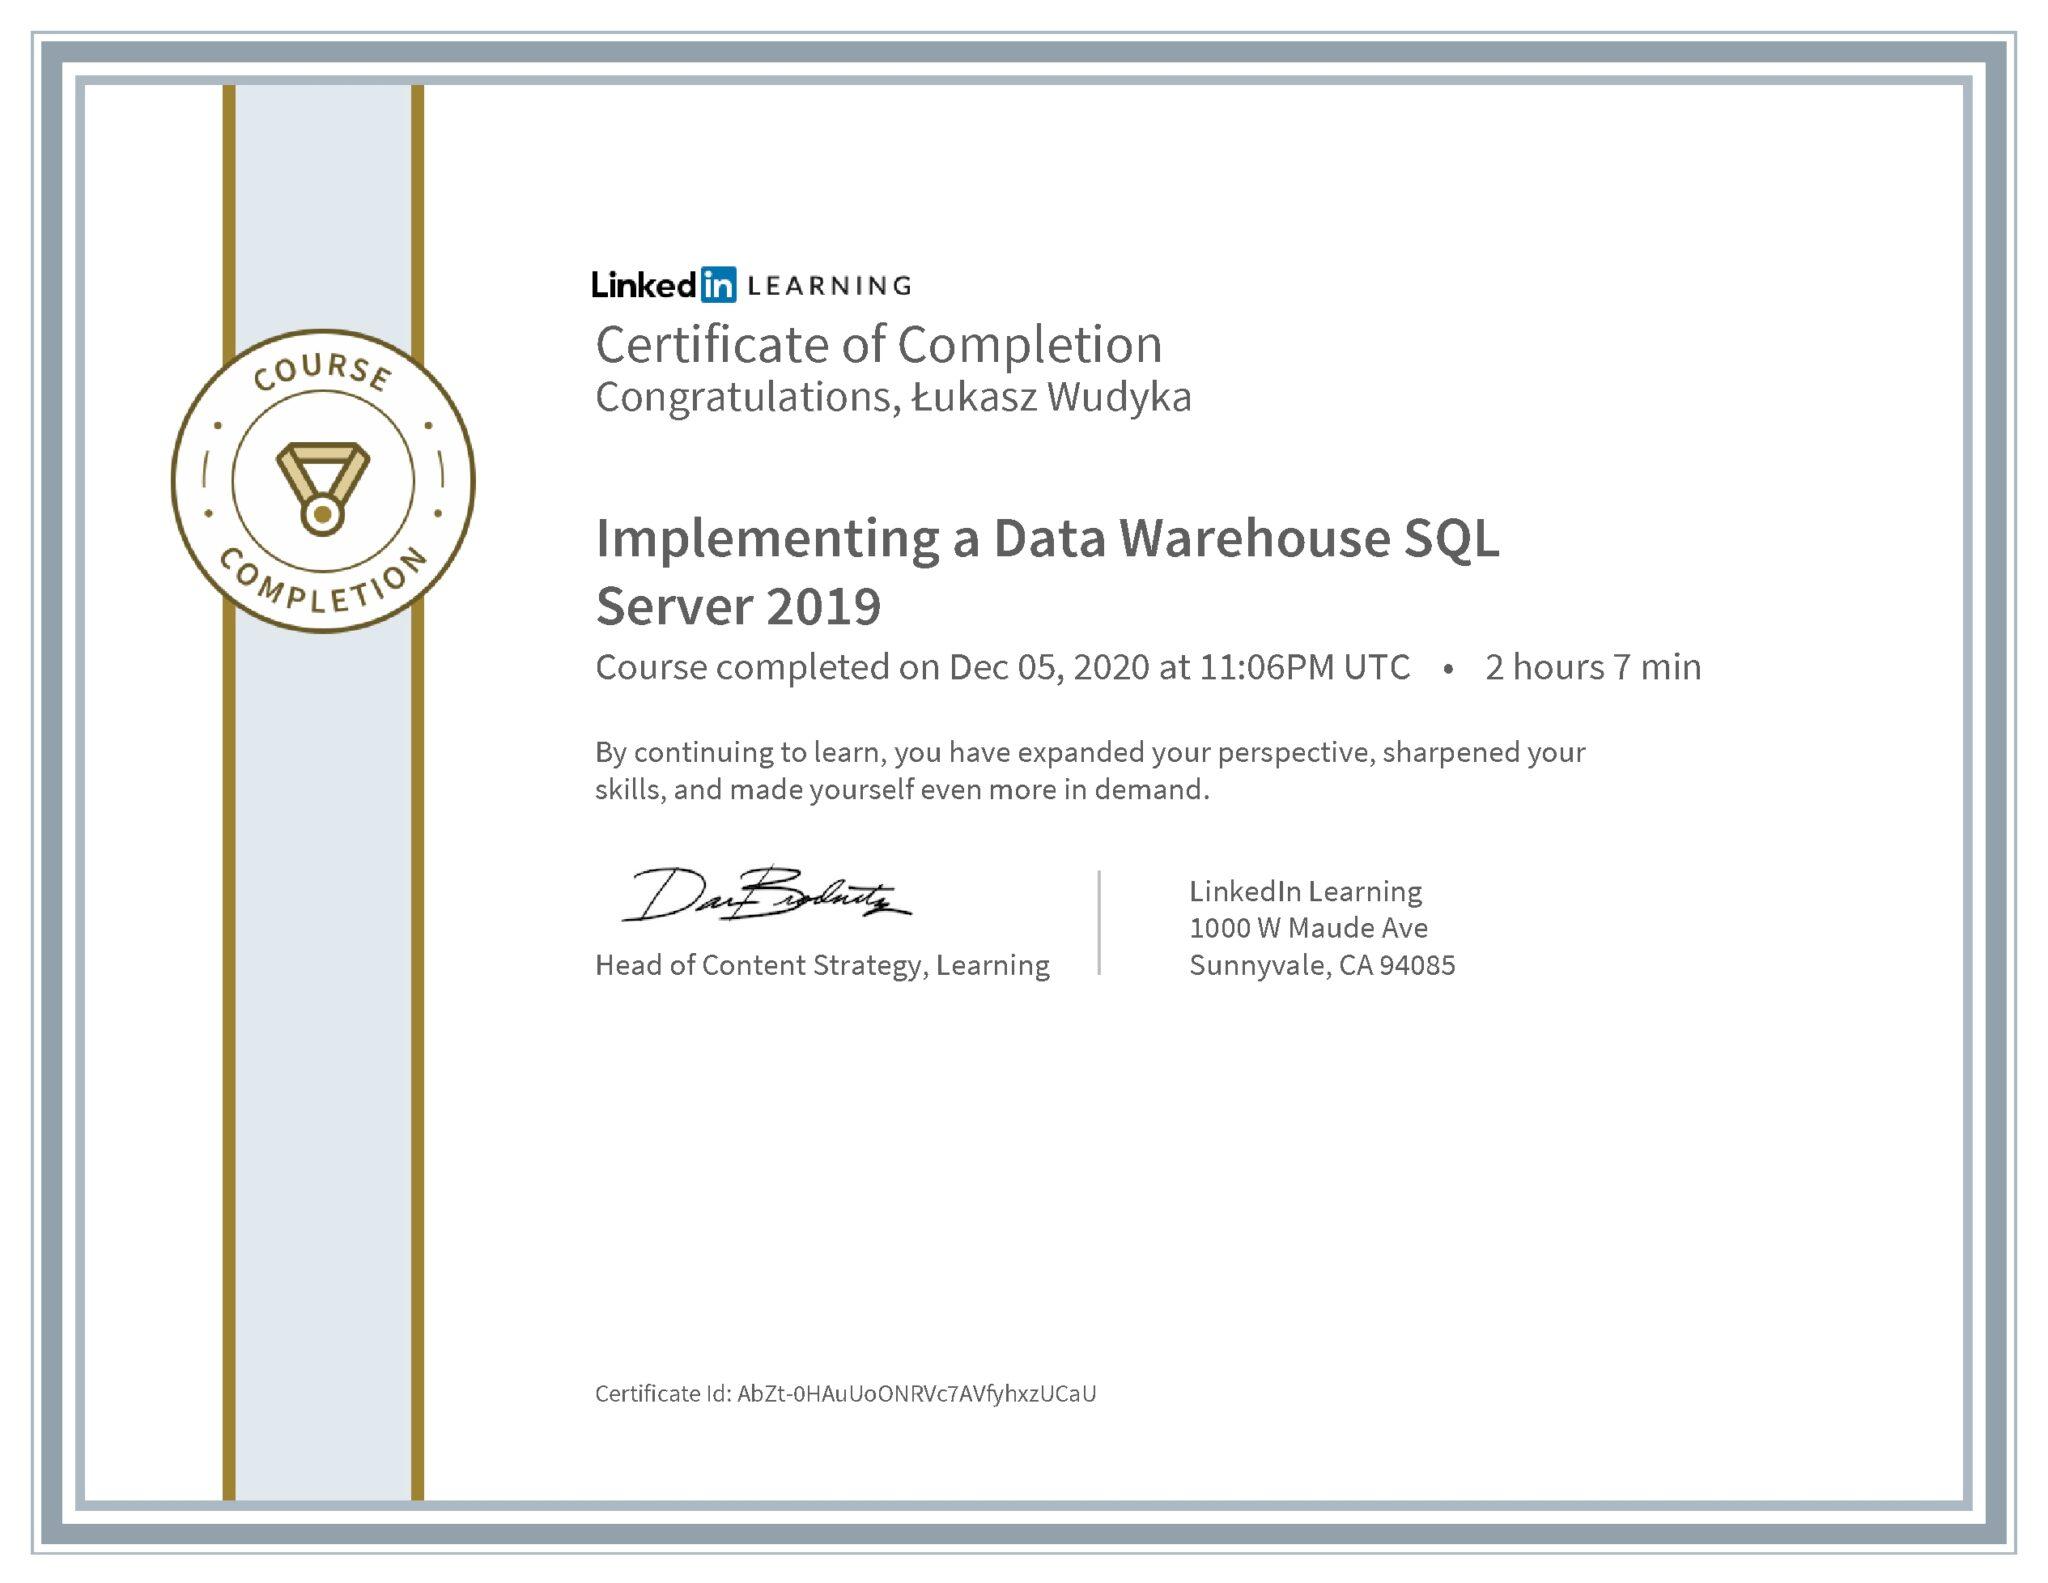 Łukasz Wudyka certyfikat LinkedIn Implementing a Data Warehouse SQL Server 2019